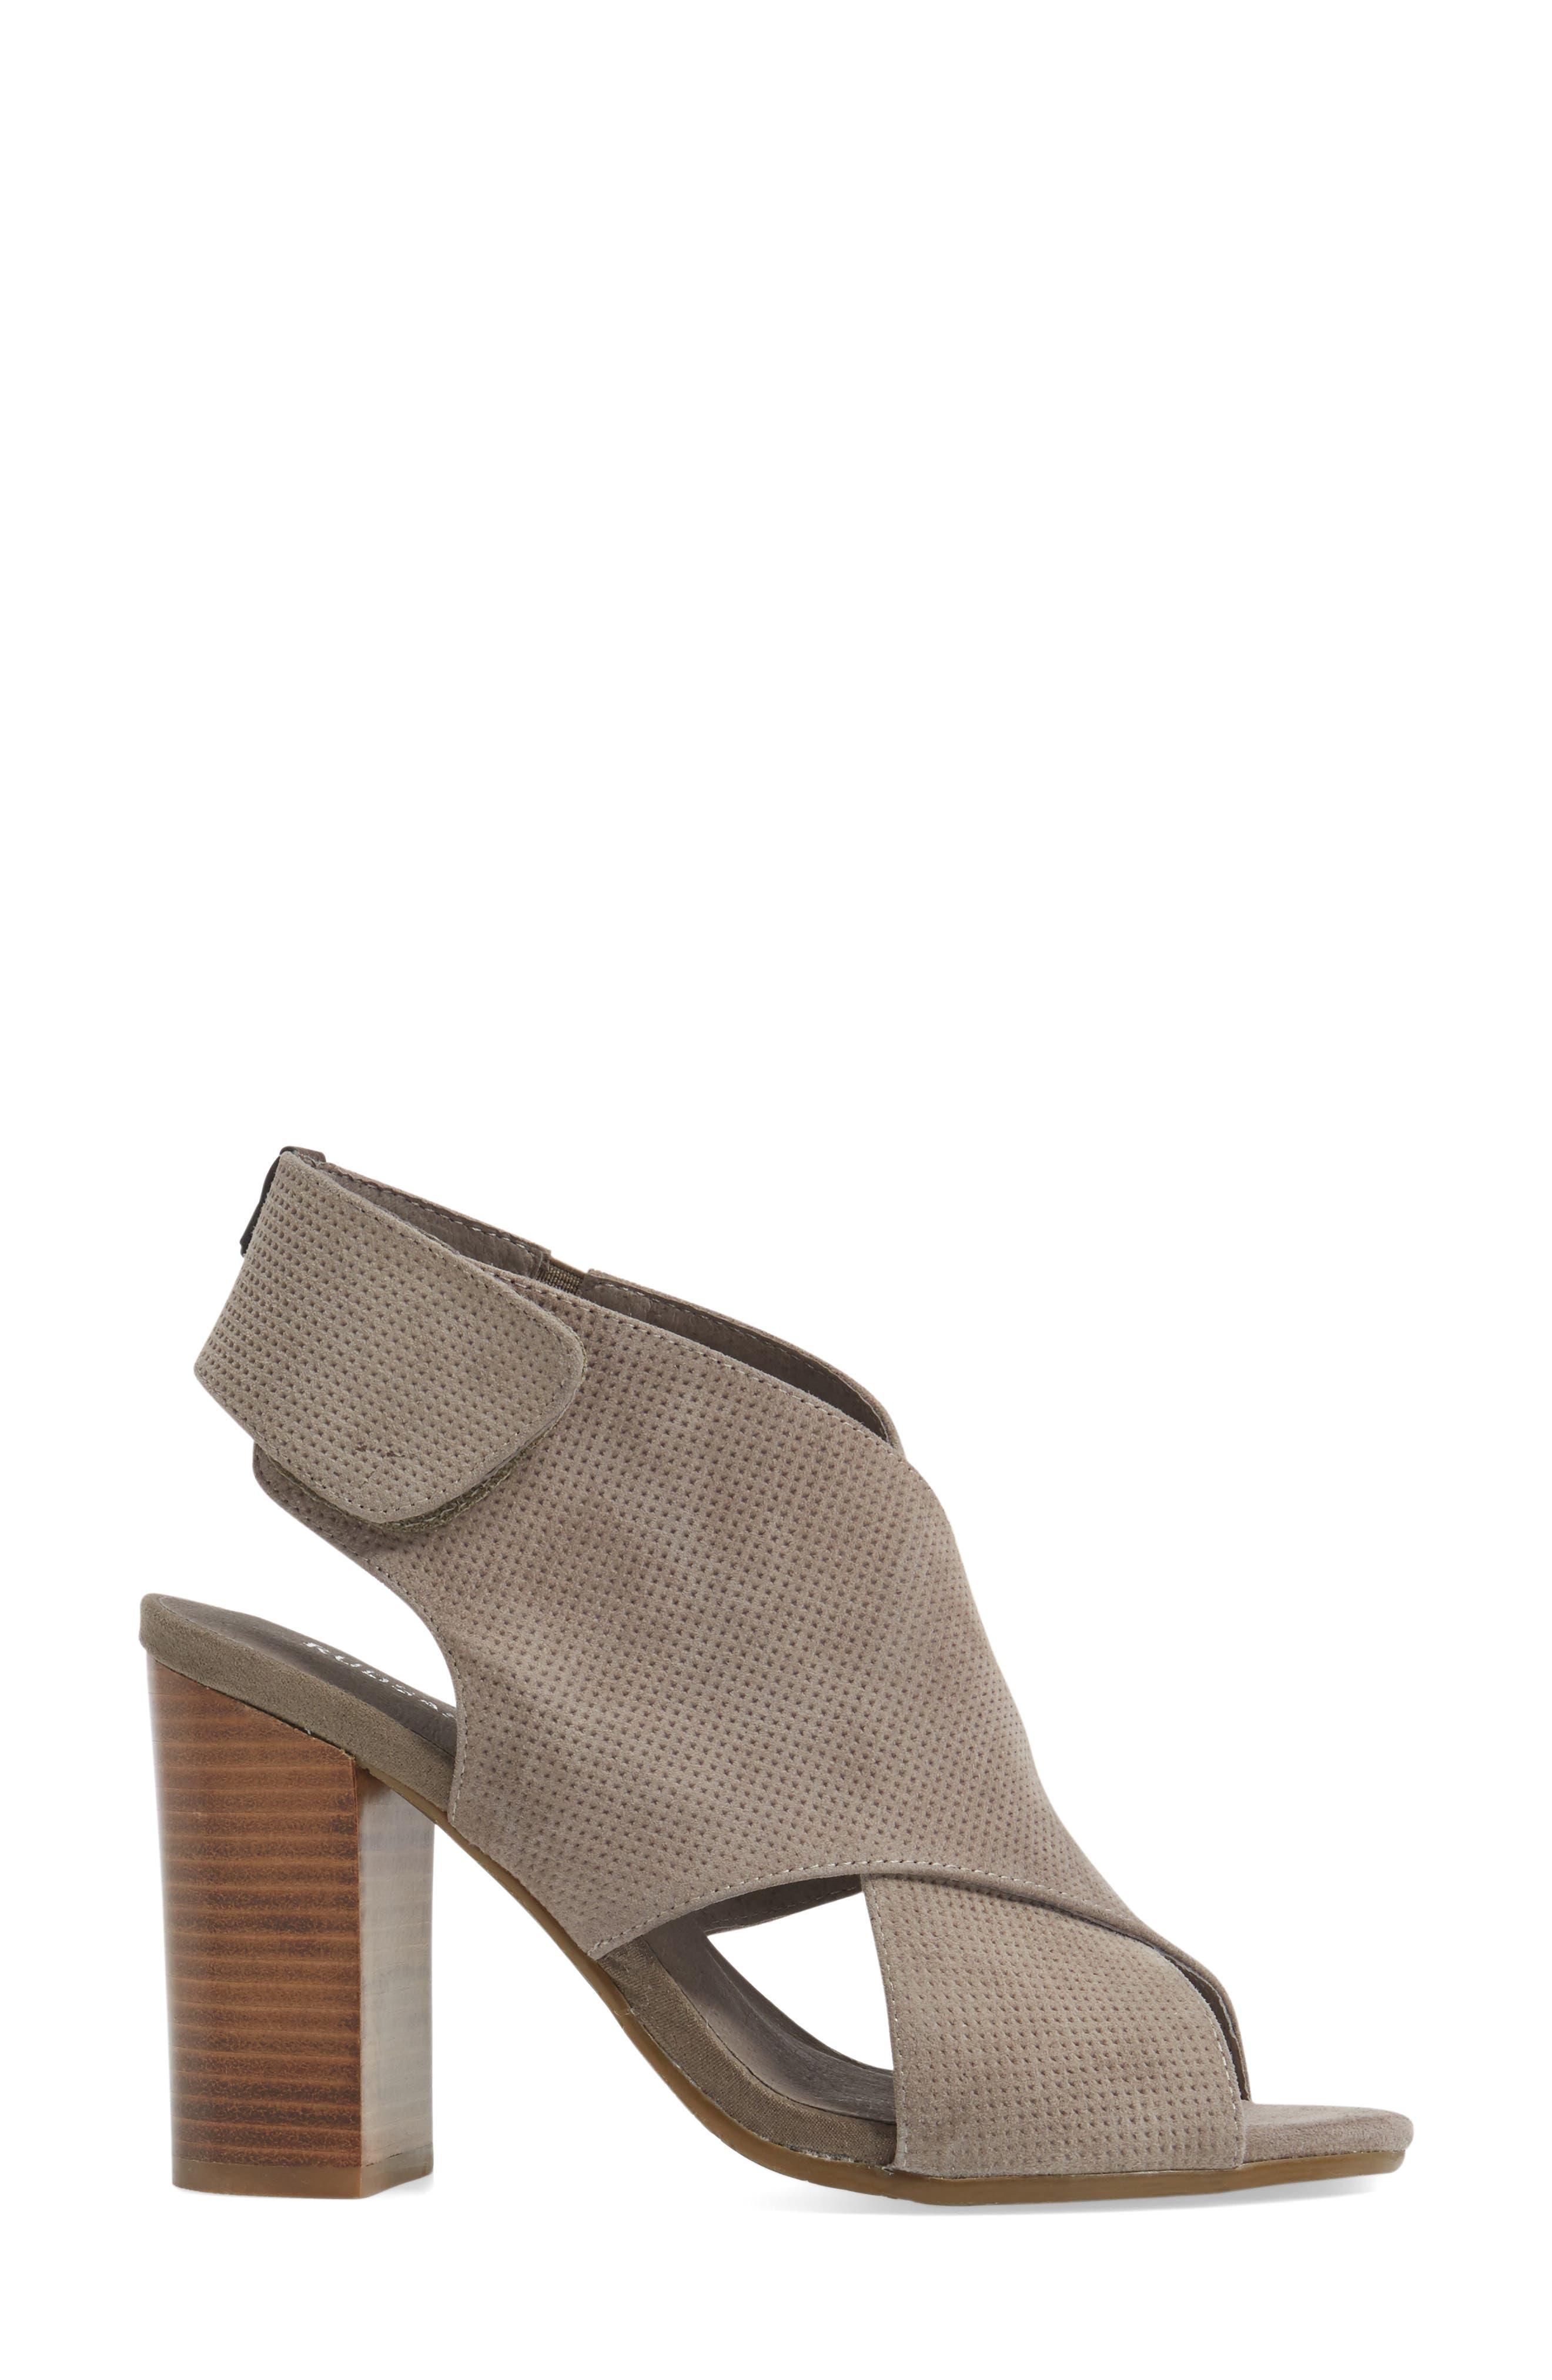 Alternate Image 3  - Rudsak Benedetta Block Heel Sandal (Women)